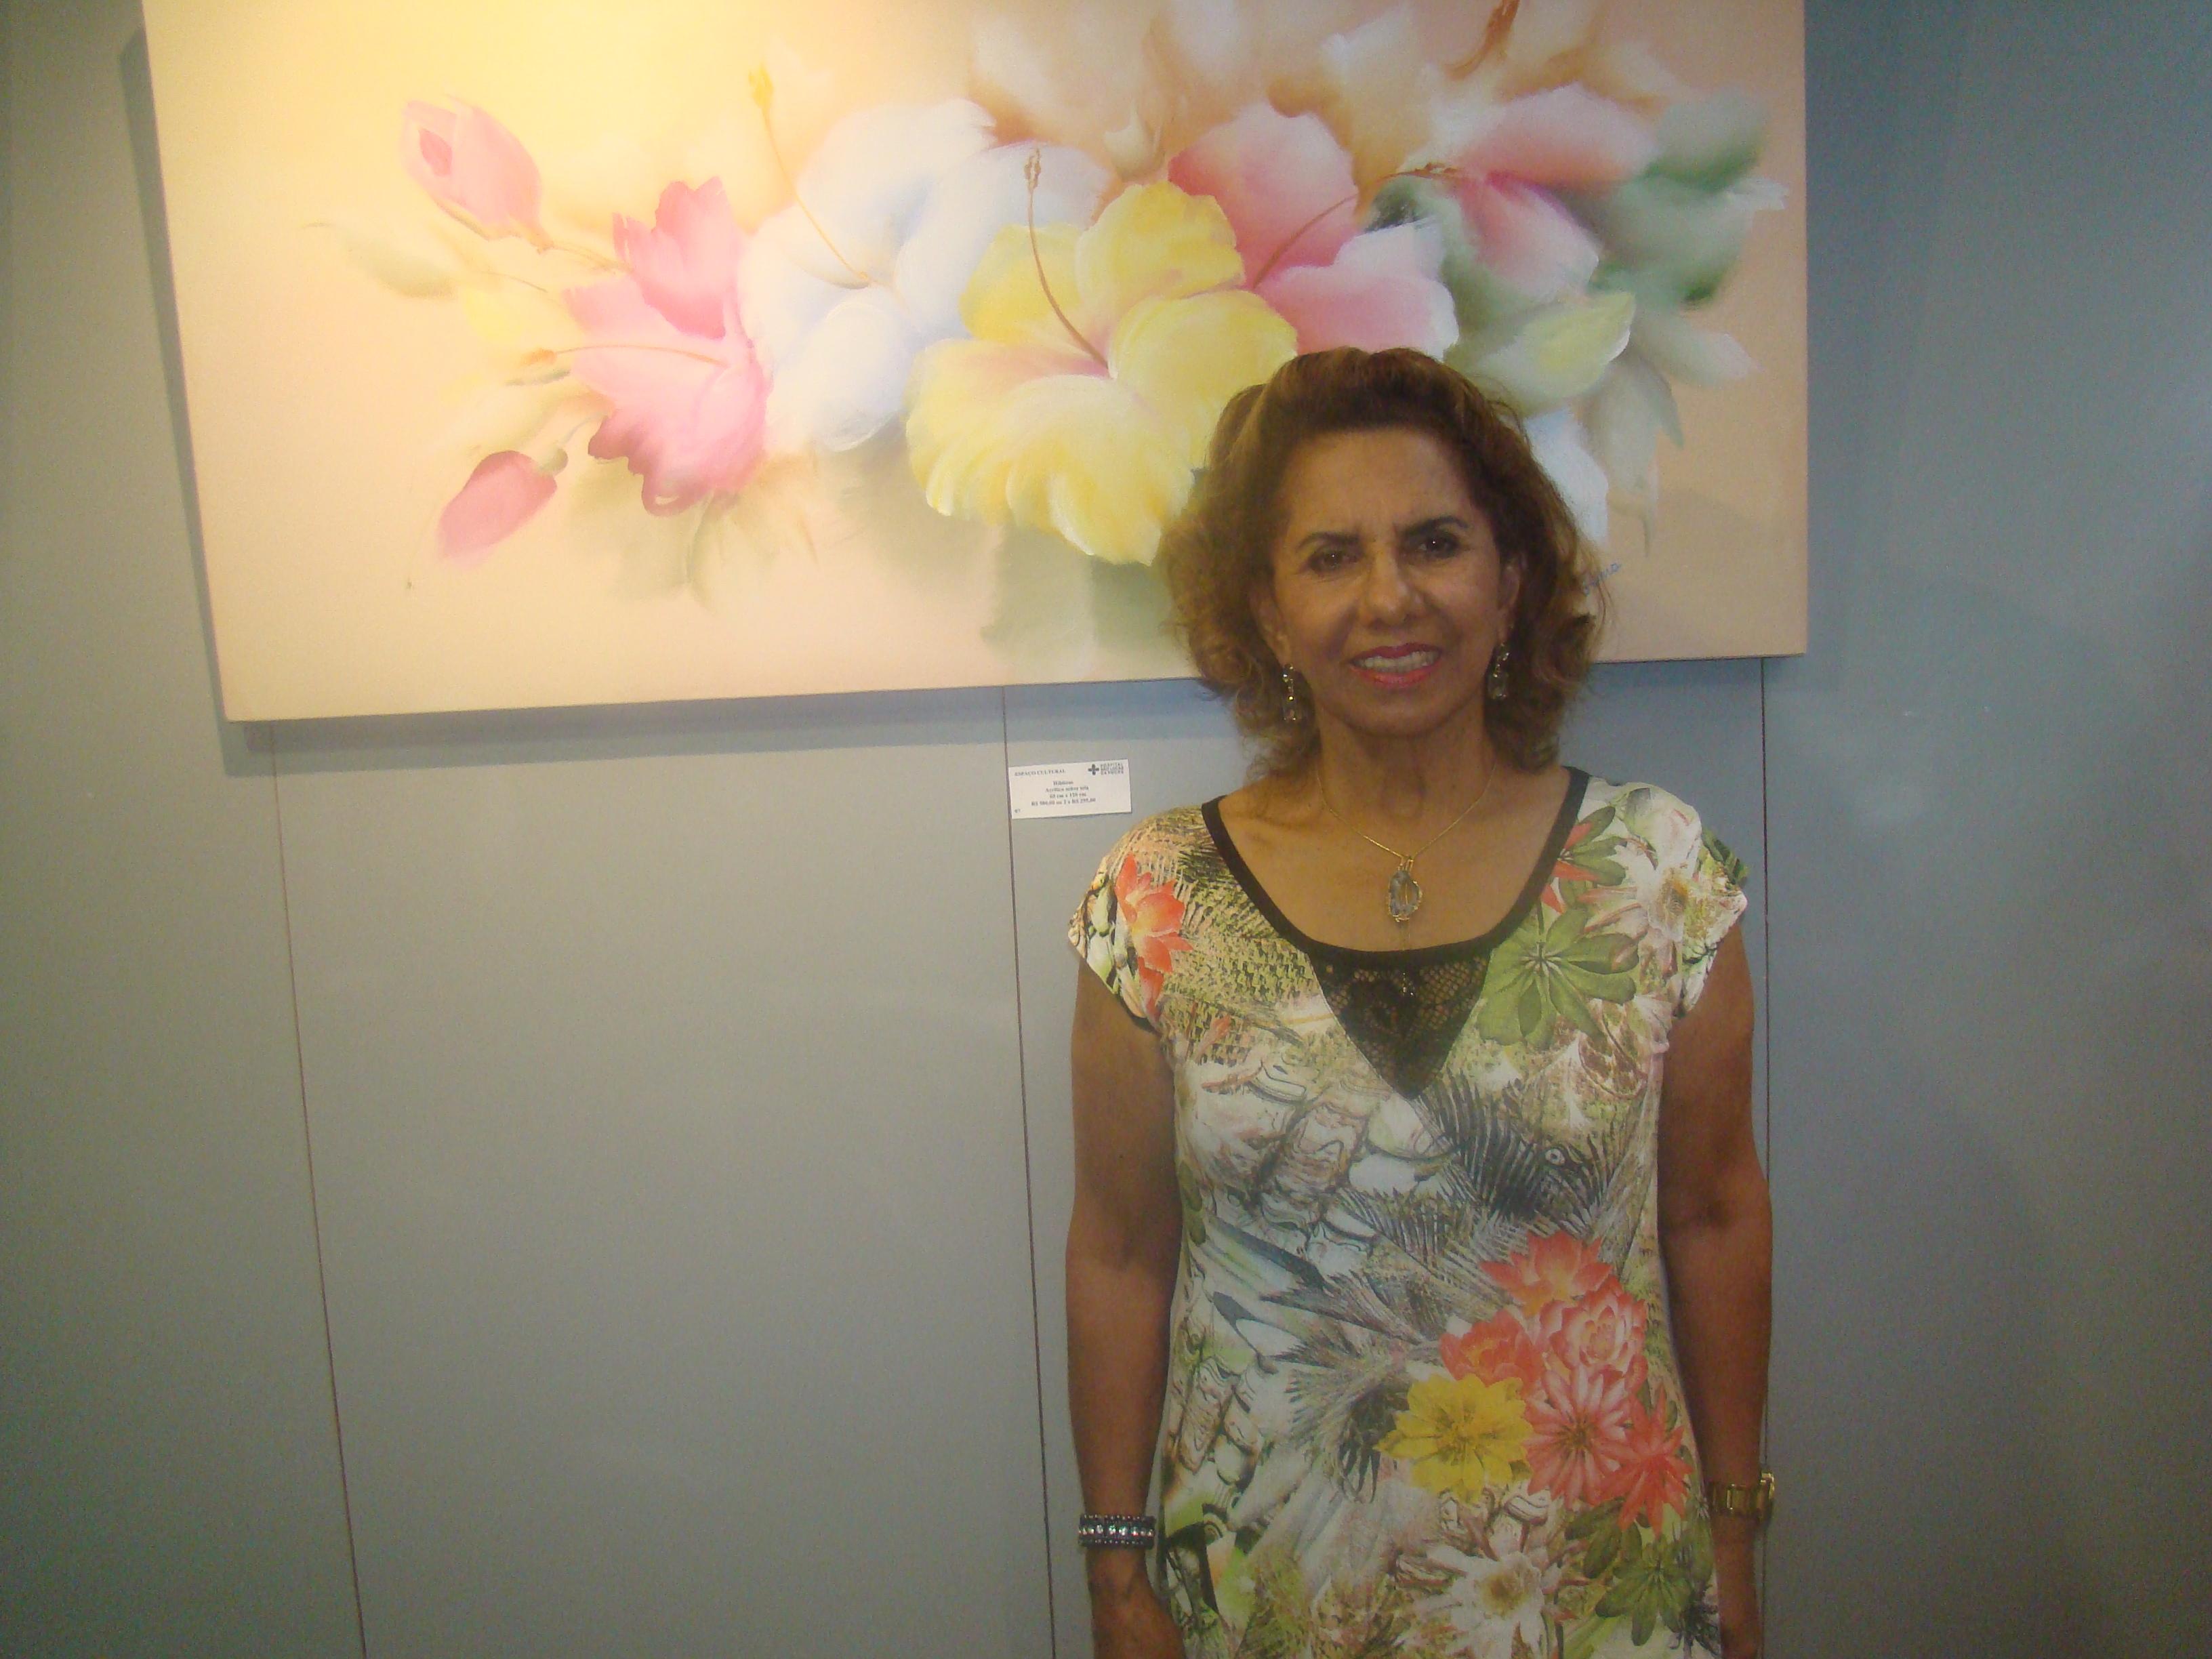 Iliria Inês Aquino Gomes